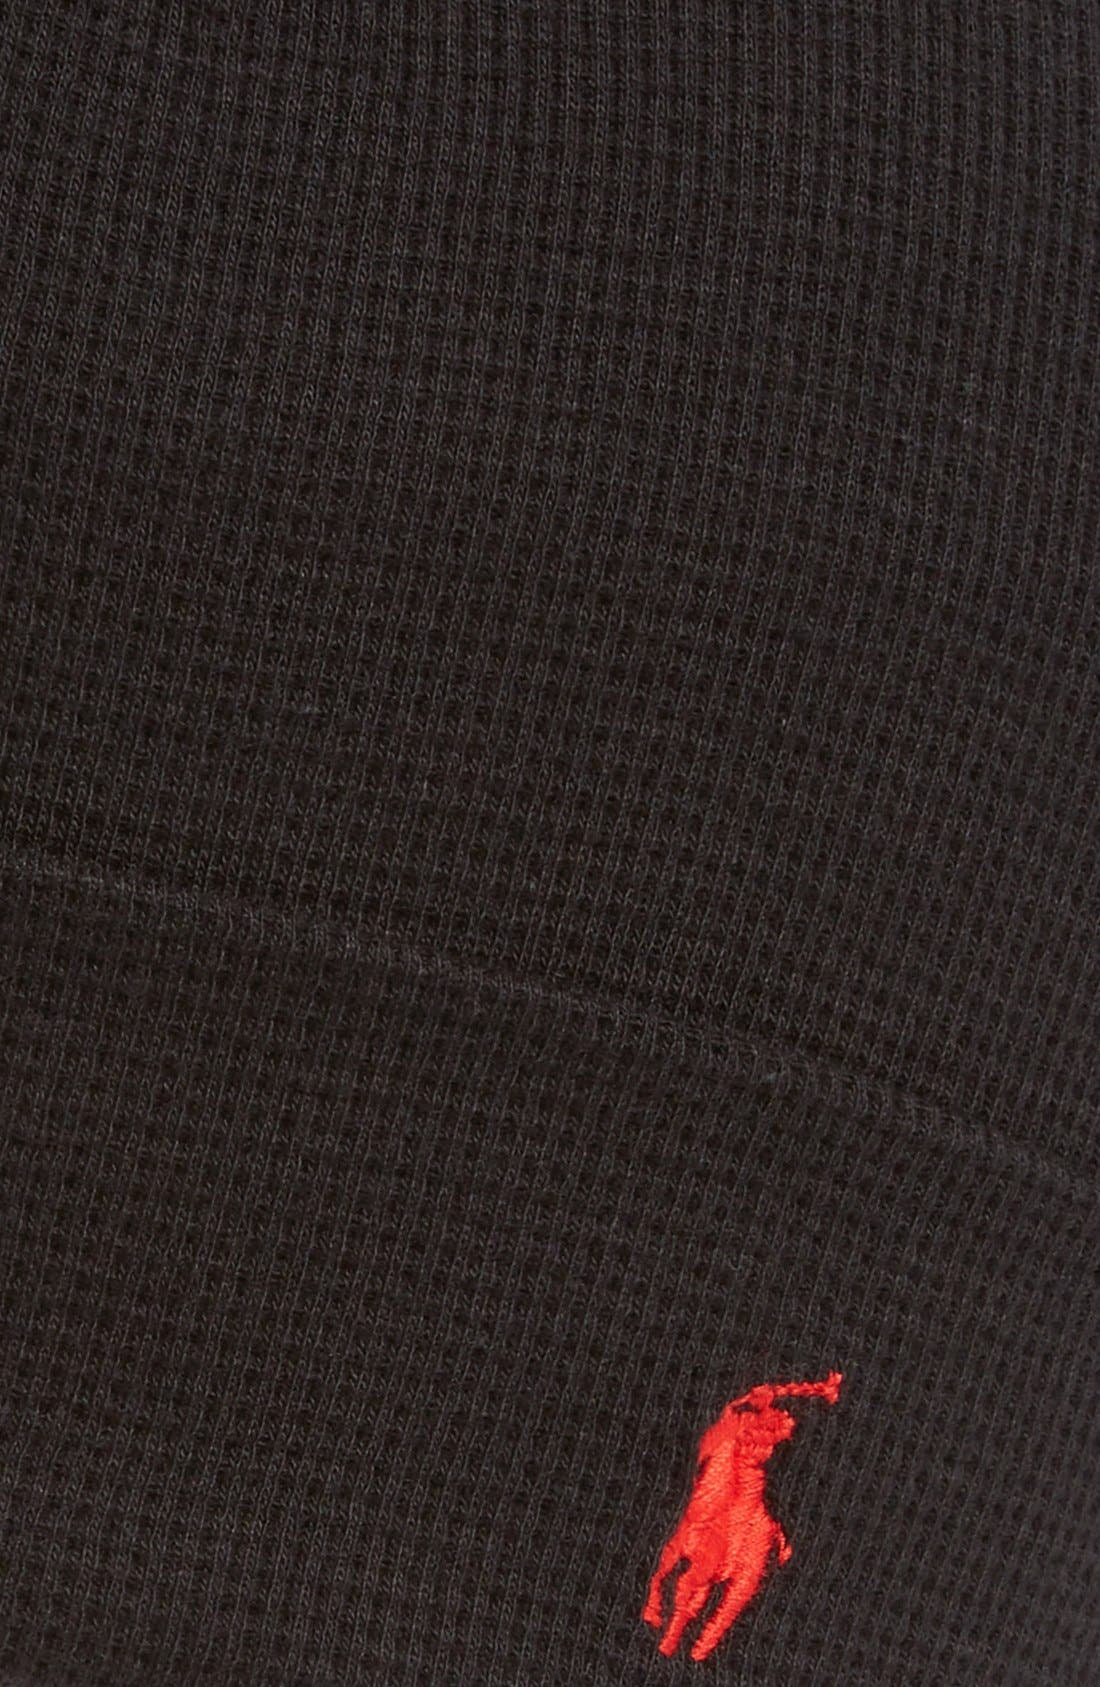 Thermal Cuff Cotton Cap,                             Alternate thumbnail 3, color,                             POLO BLACK